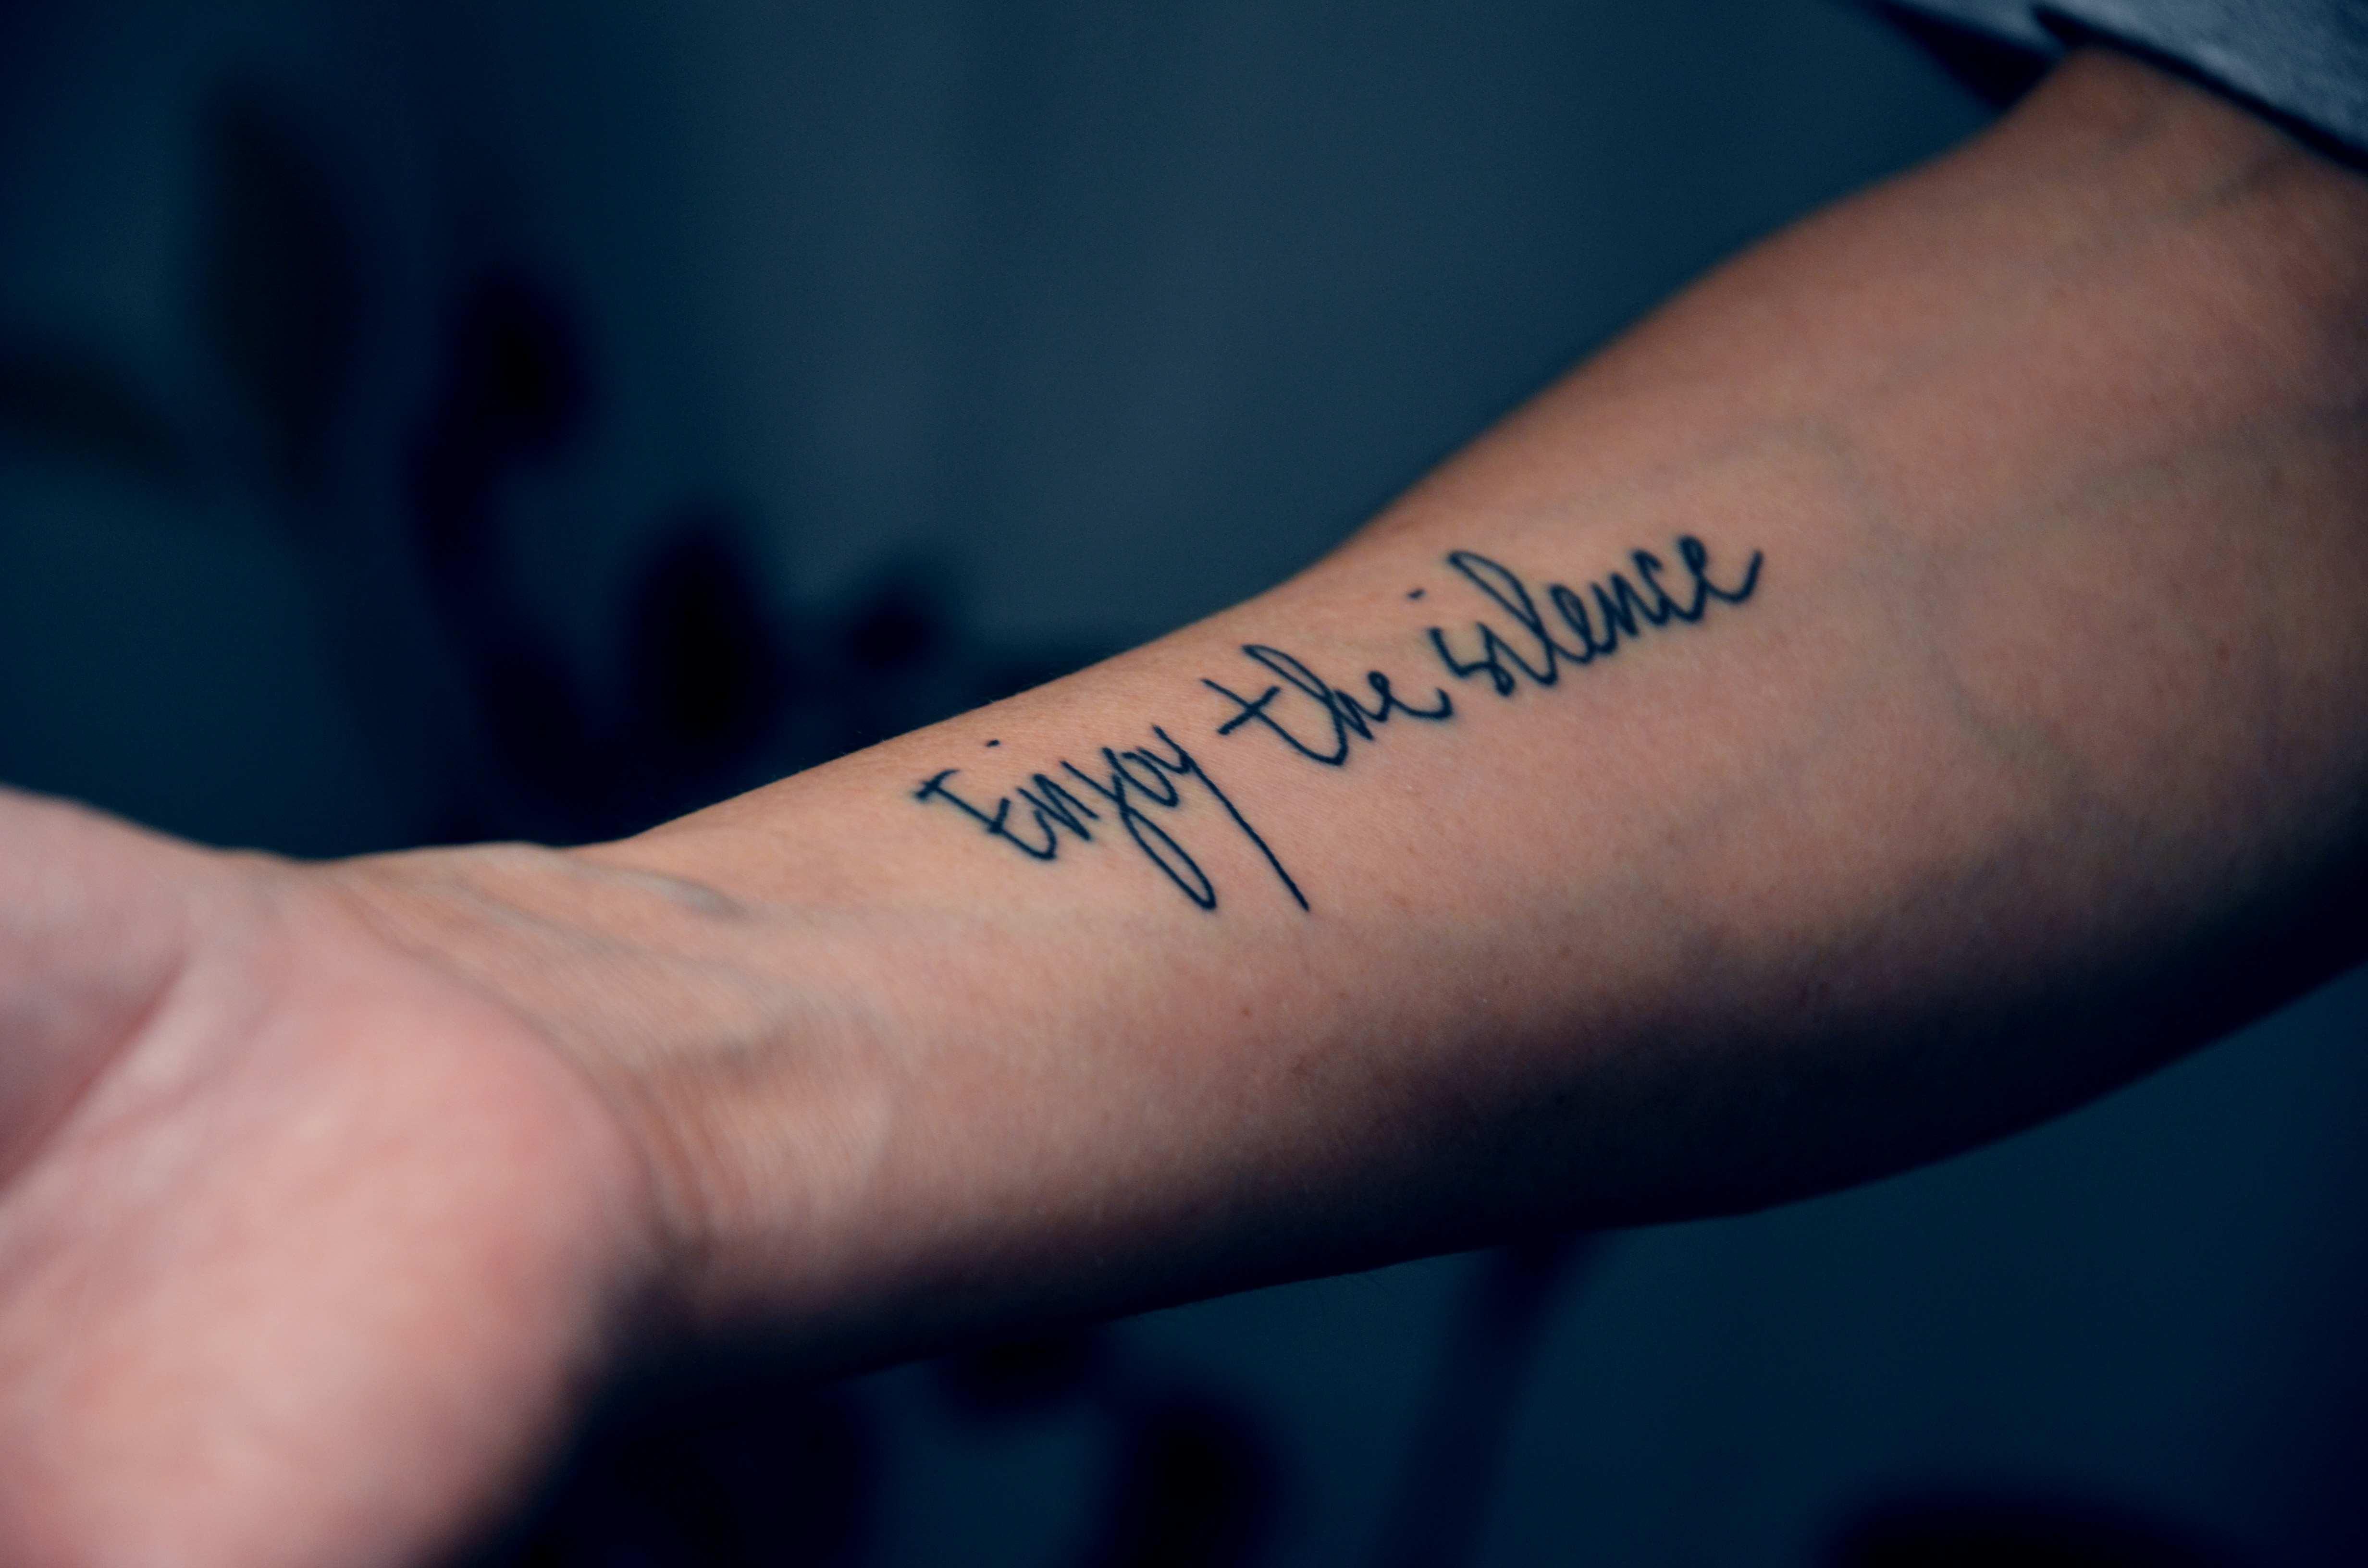 113798a2d7775 Inner arm script tattoo designs for men